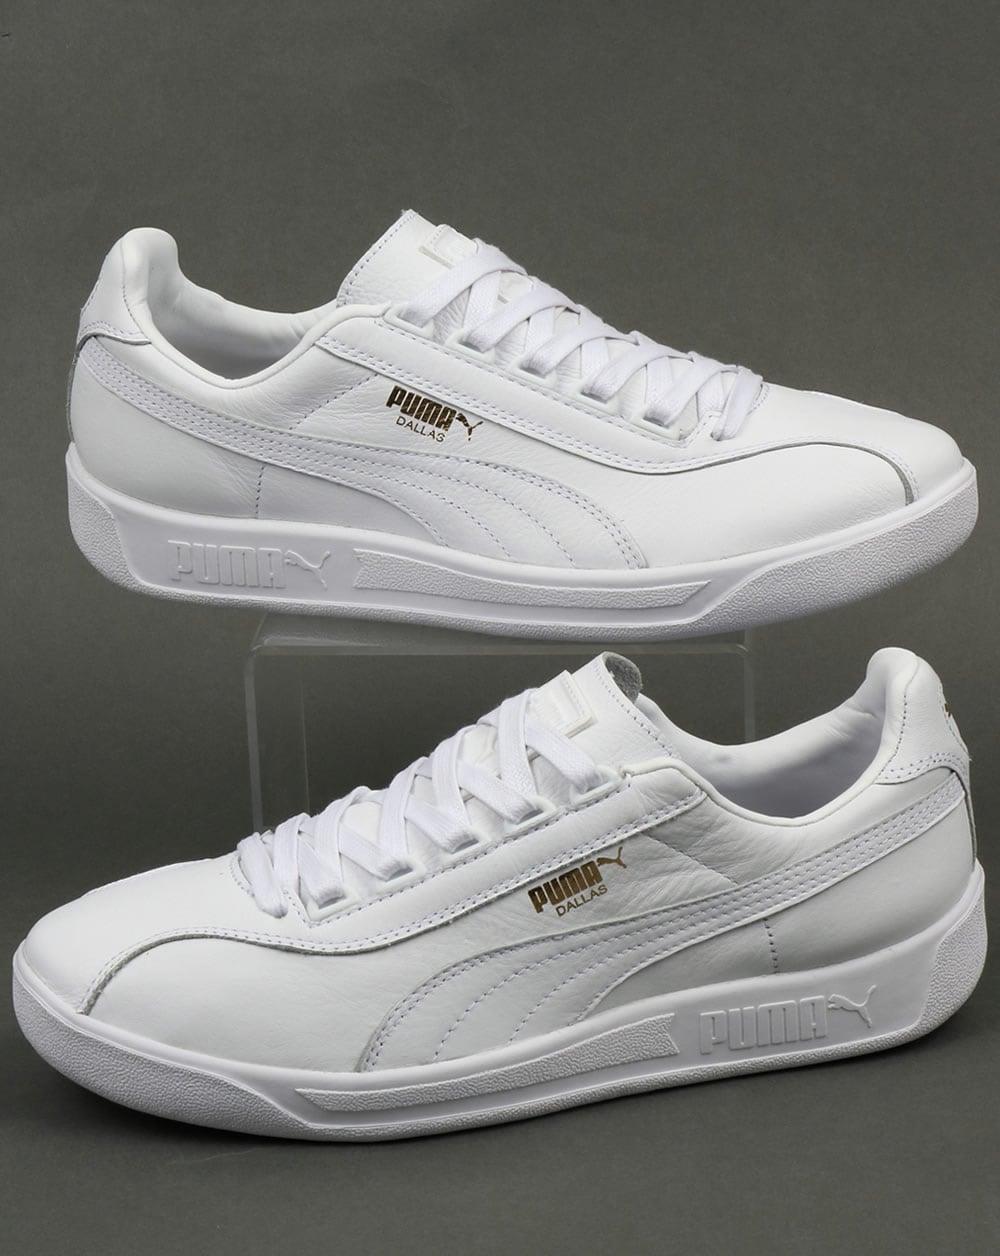 retro puma shoes Sale,up to 33% Discounts